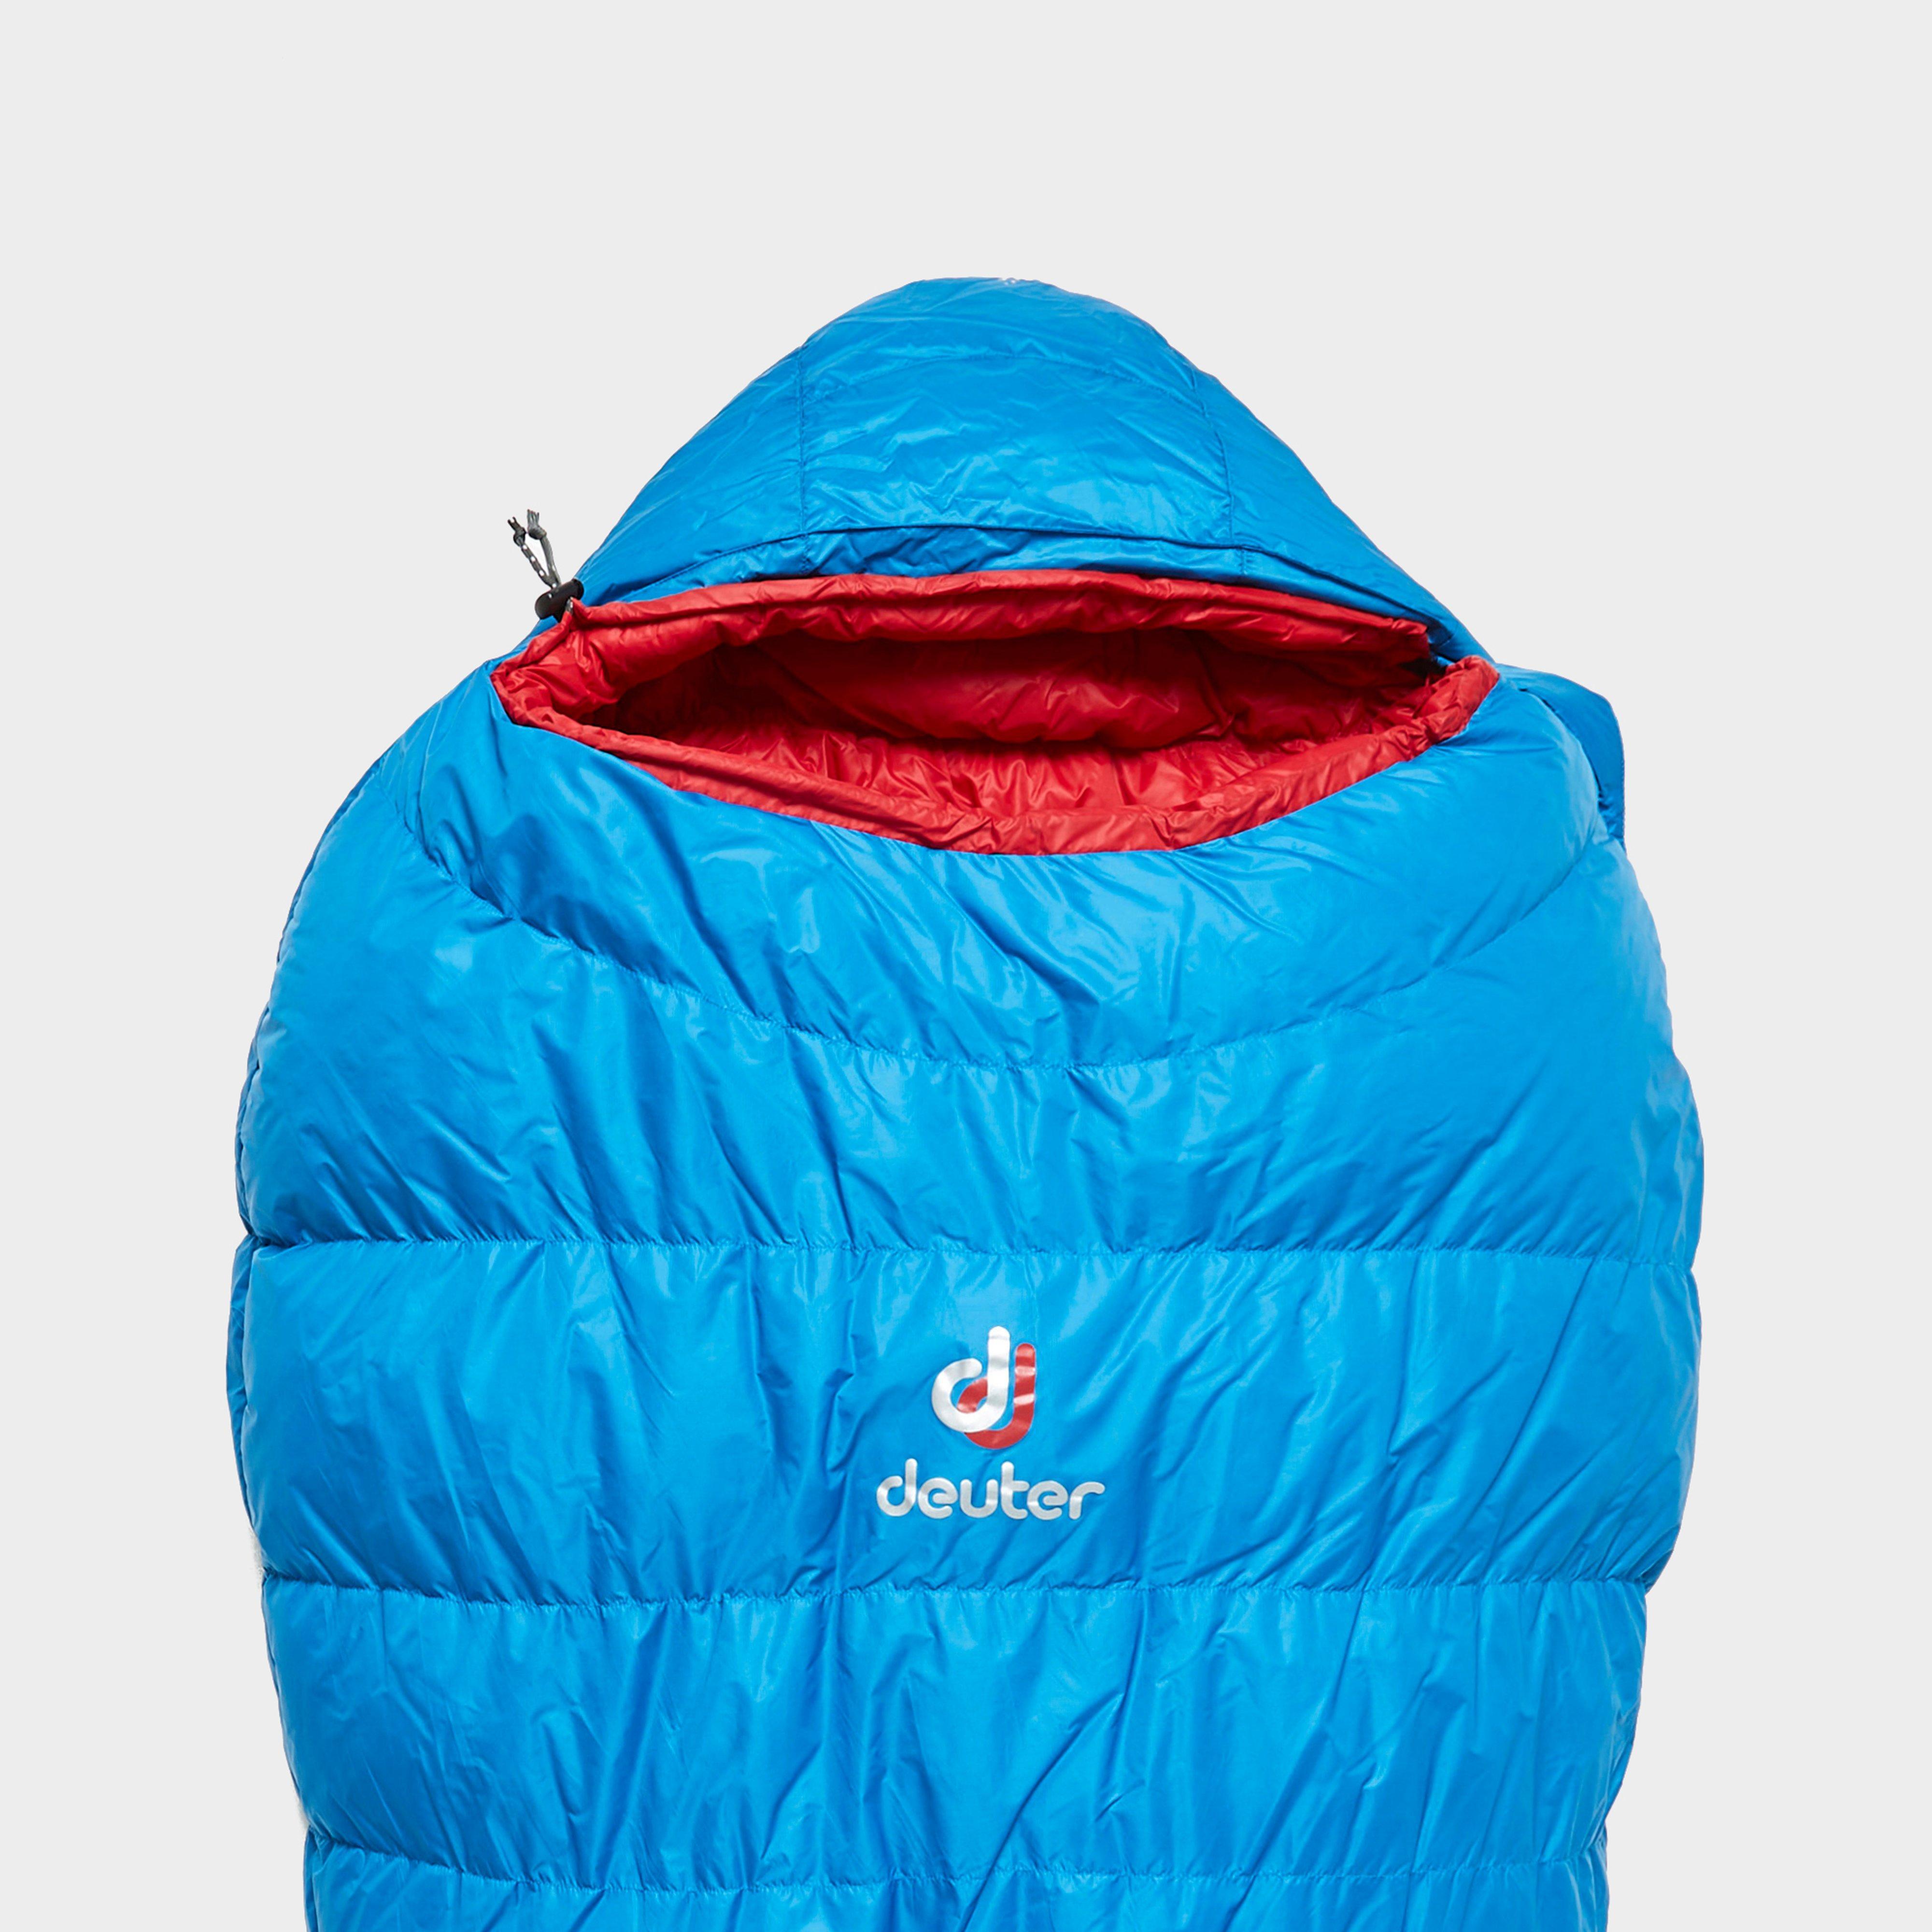 Deuter Deuter Astro Pro 600 Sleeping Bag, Blue